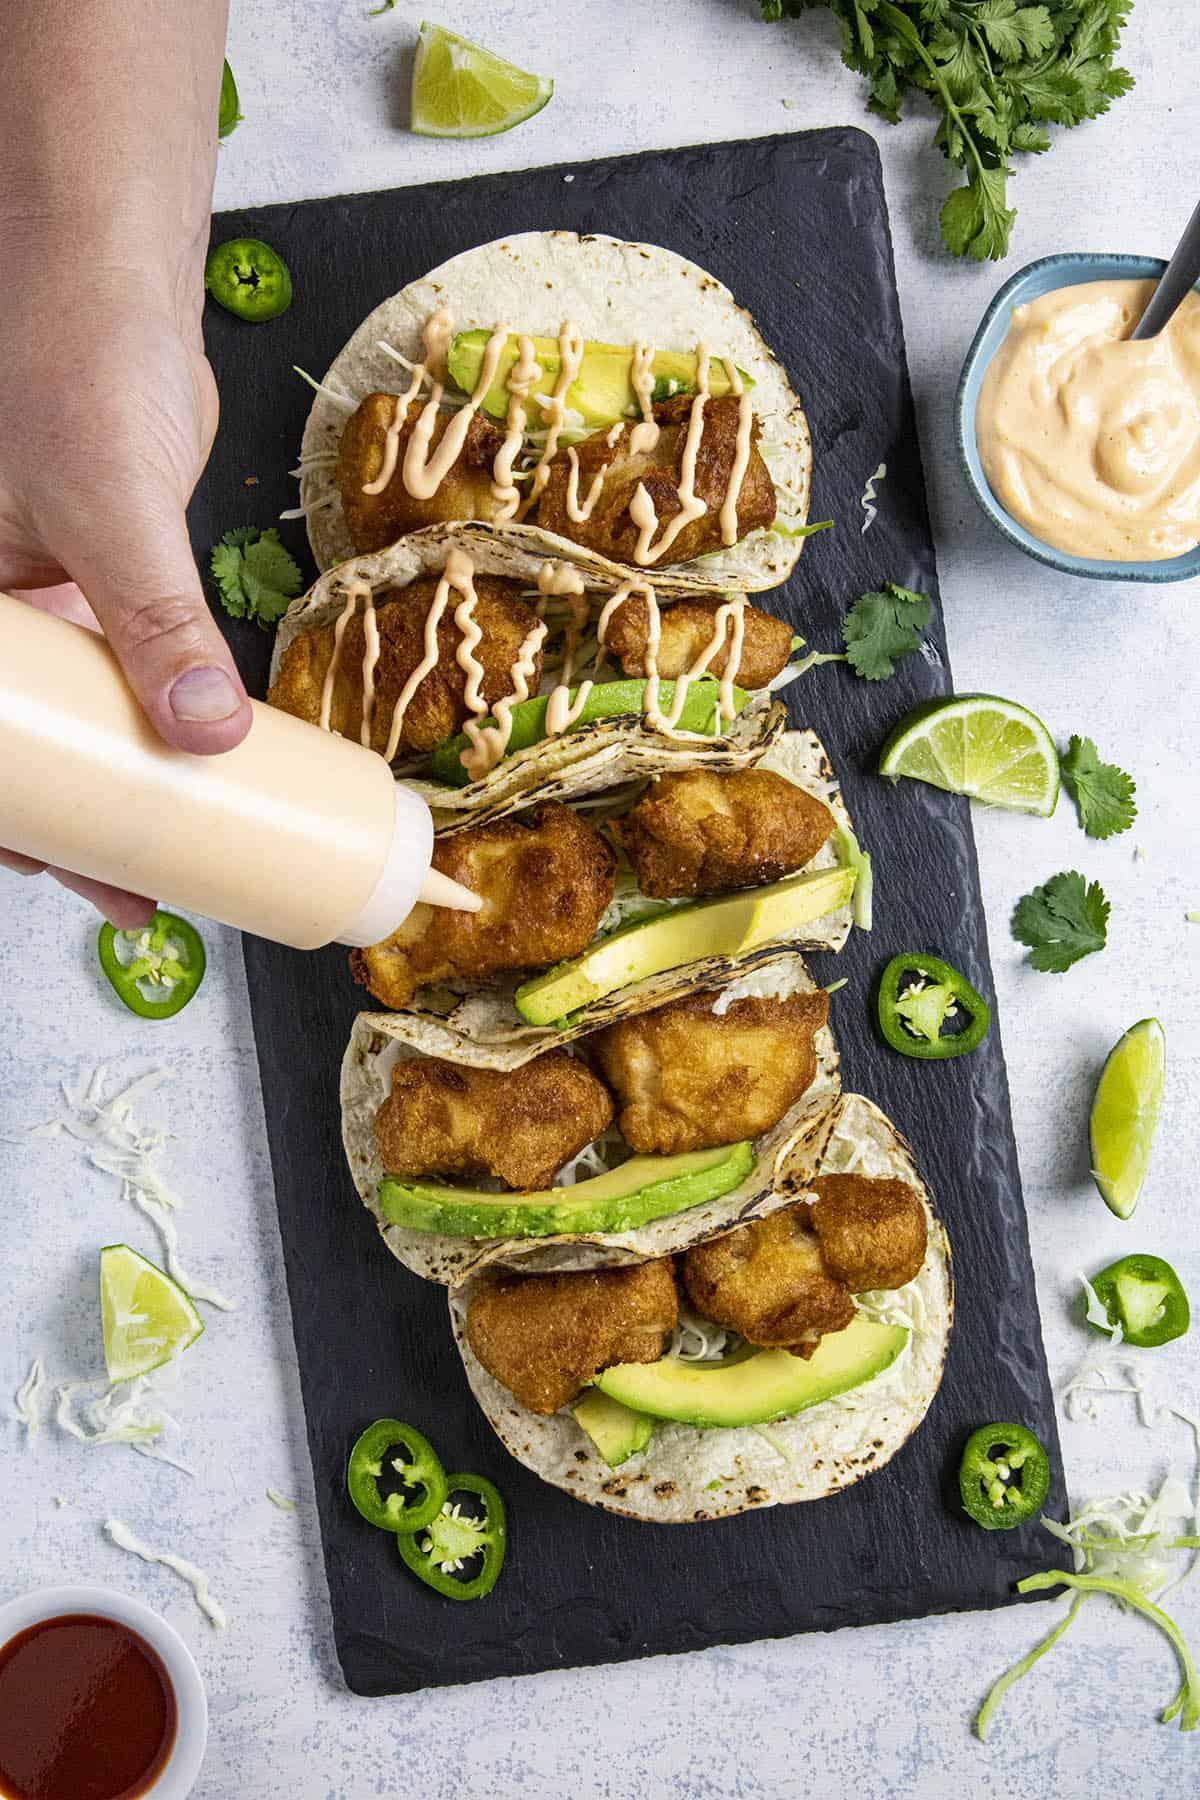 Adding sauce to our baja fish tacos